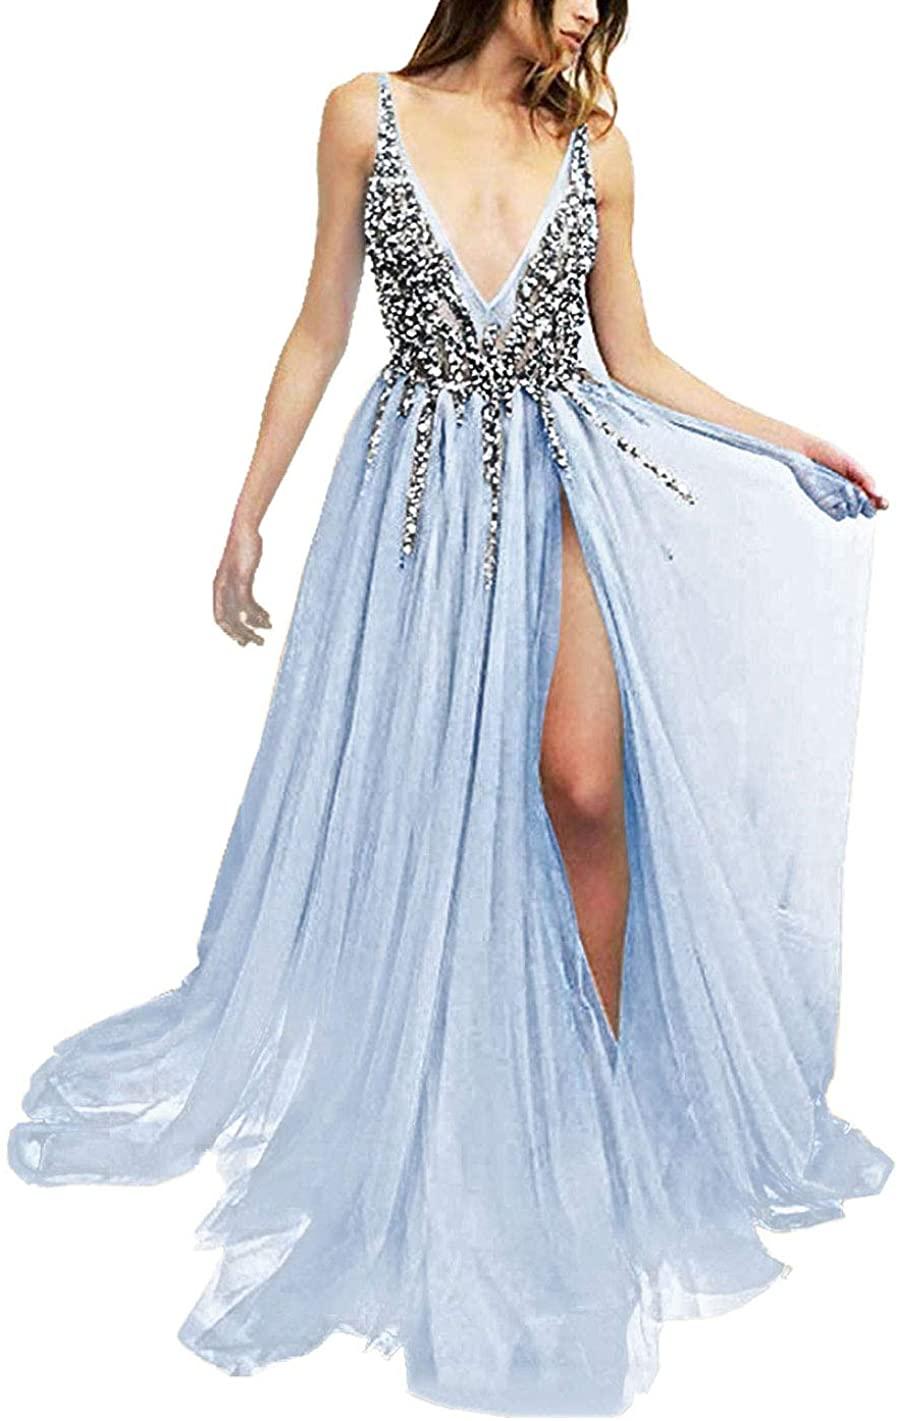 Prom Dresses Long Evening Formal Dress Deep V Neck Sequins Beaded Prom Gowns High Split Womens